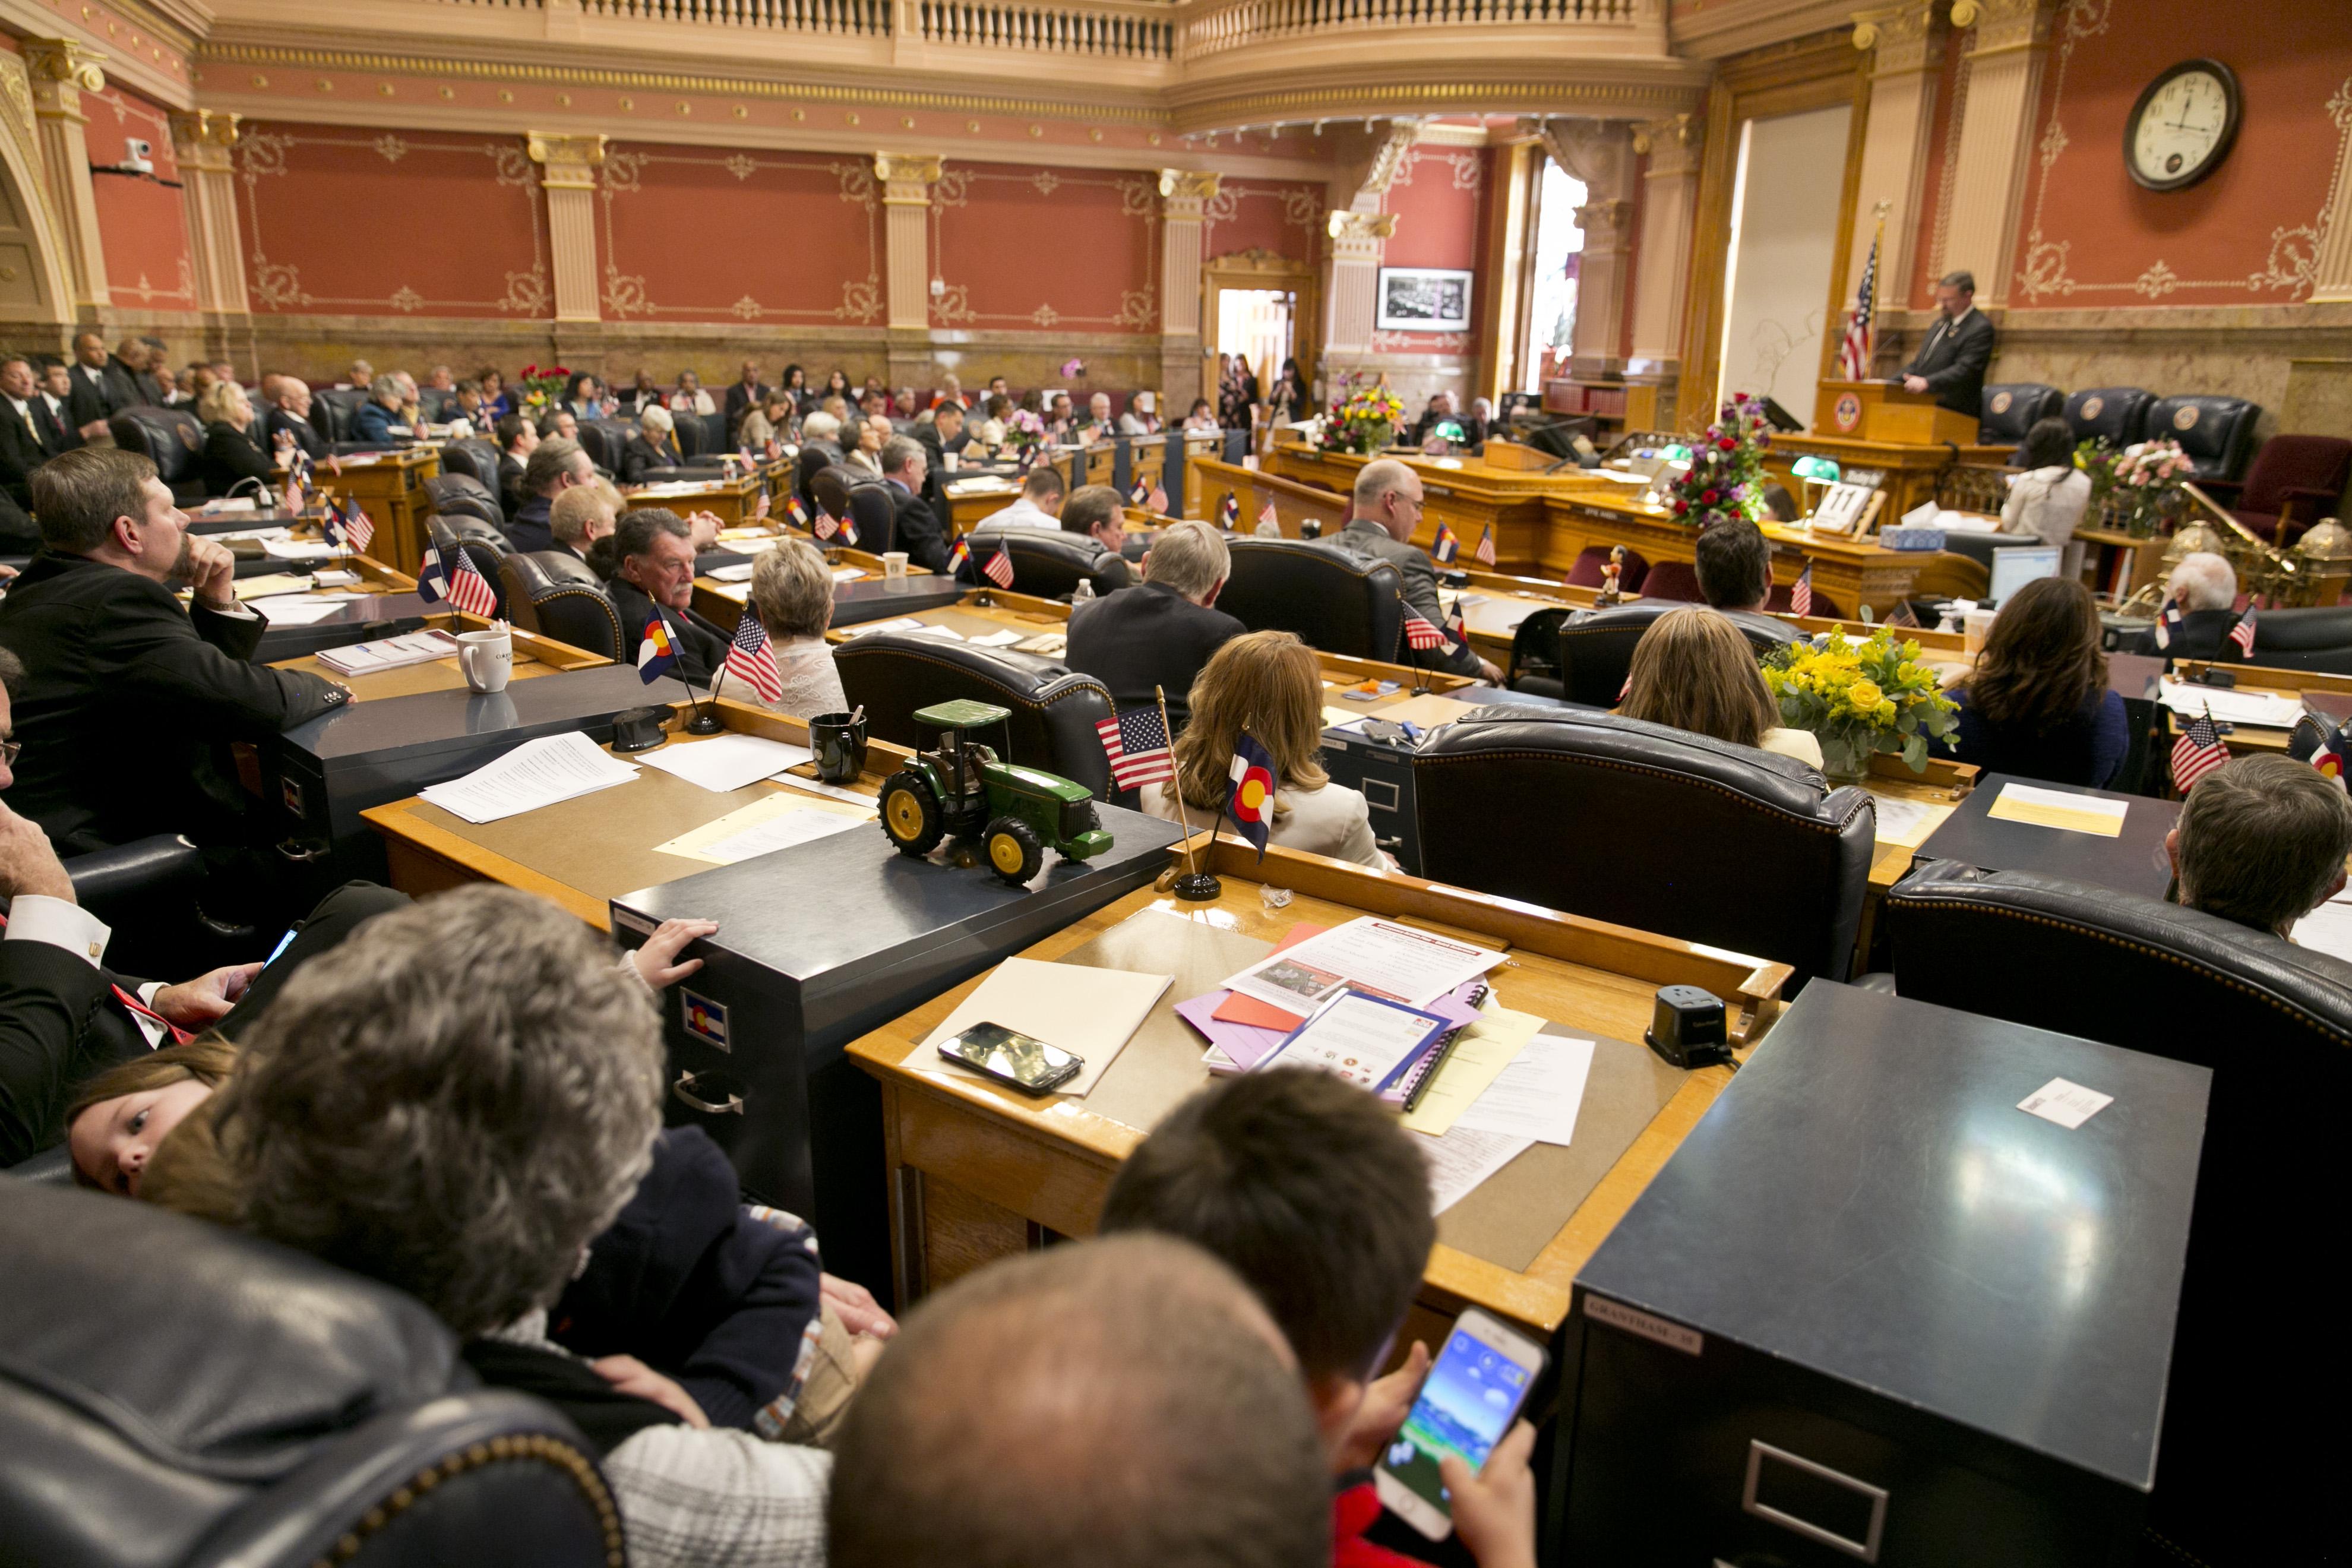 Photo: Capitol Jan 11 2017 17 | Colorado Senate chambers